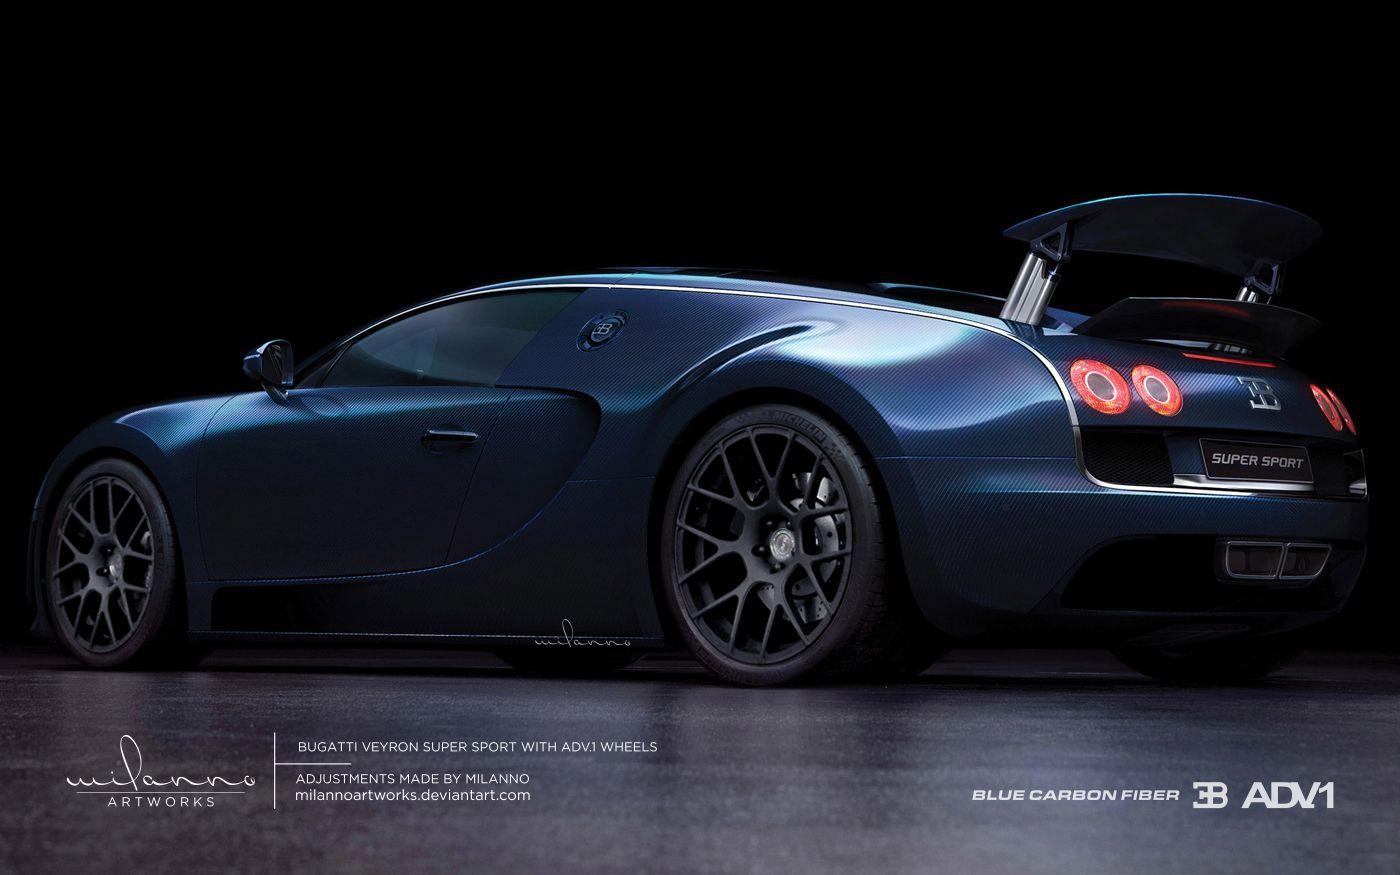 Bugatti Motorcycle Bugatti Veyron Super Sport With Adv 1 Wheels